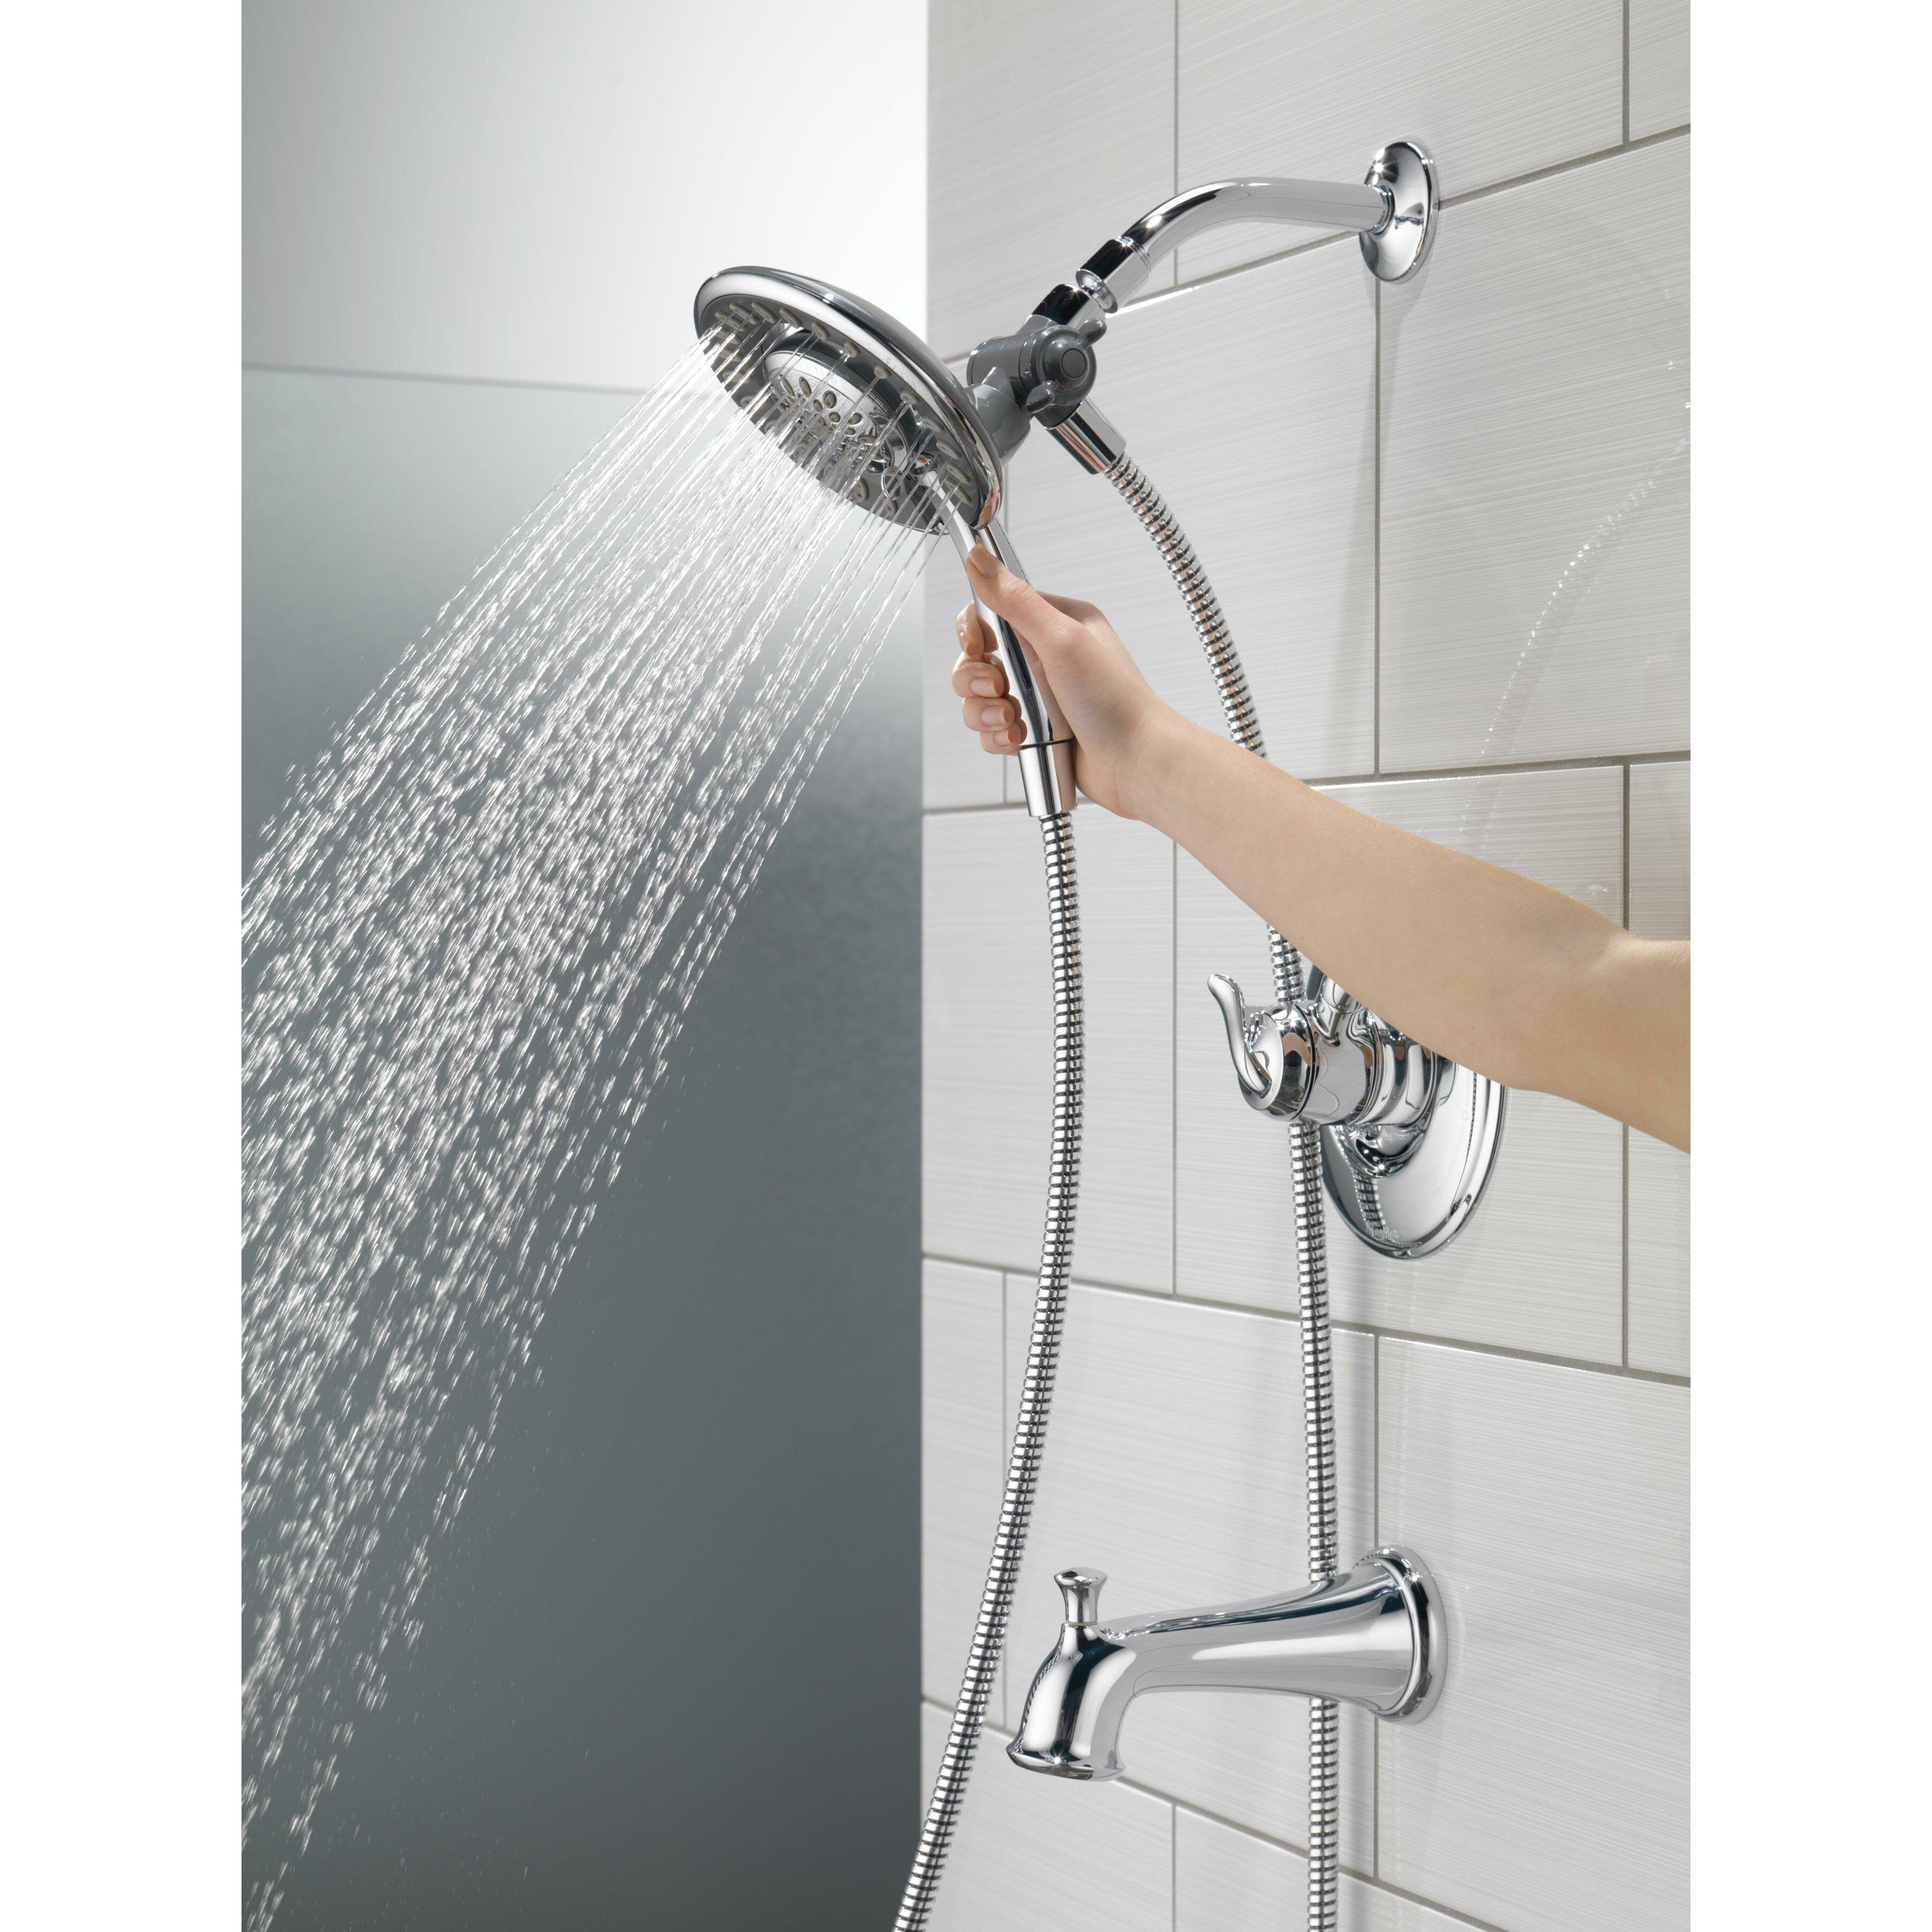 Dual Shower Head House Beautifull Living Rooms Ideas